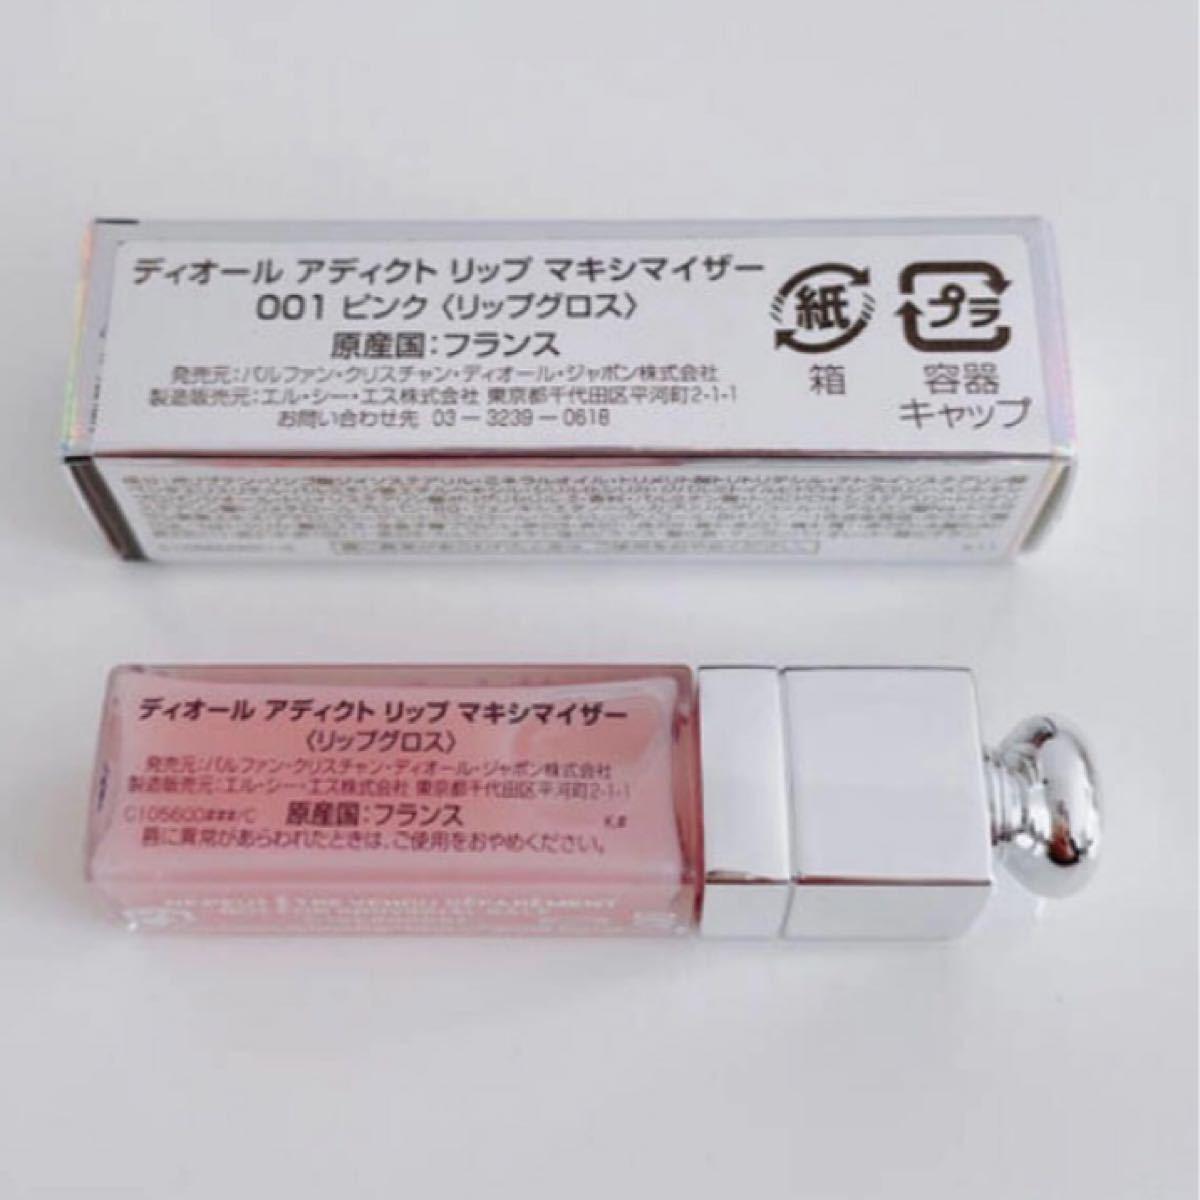 Dior ディオール アディクトリップマキシマイザー001ピンク ミニ